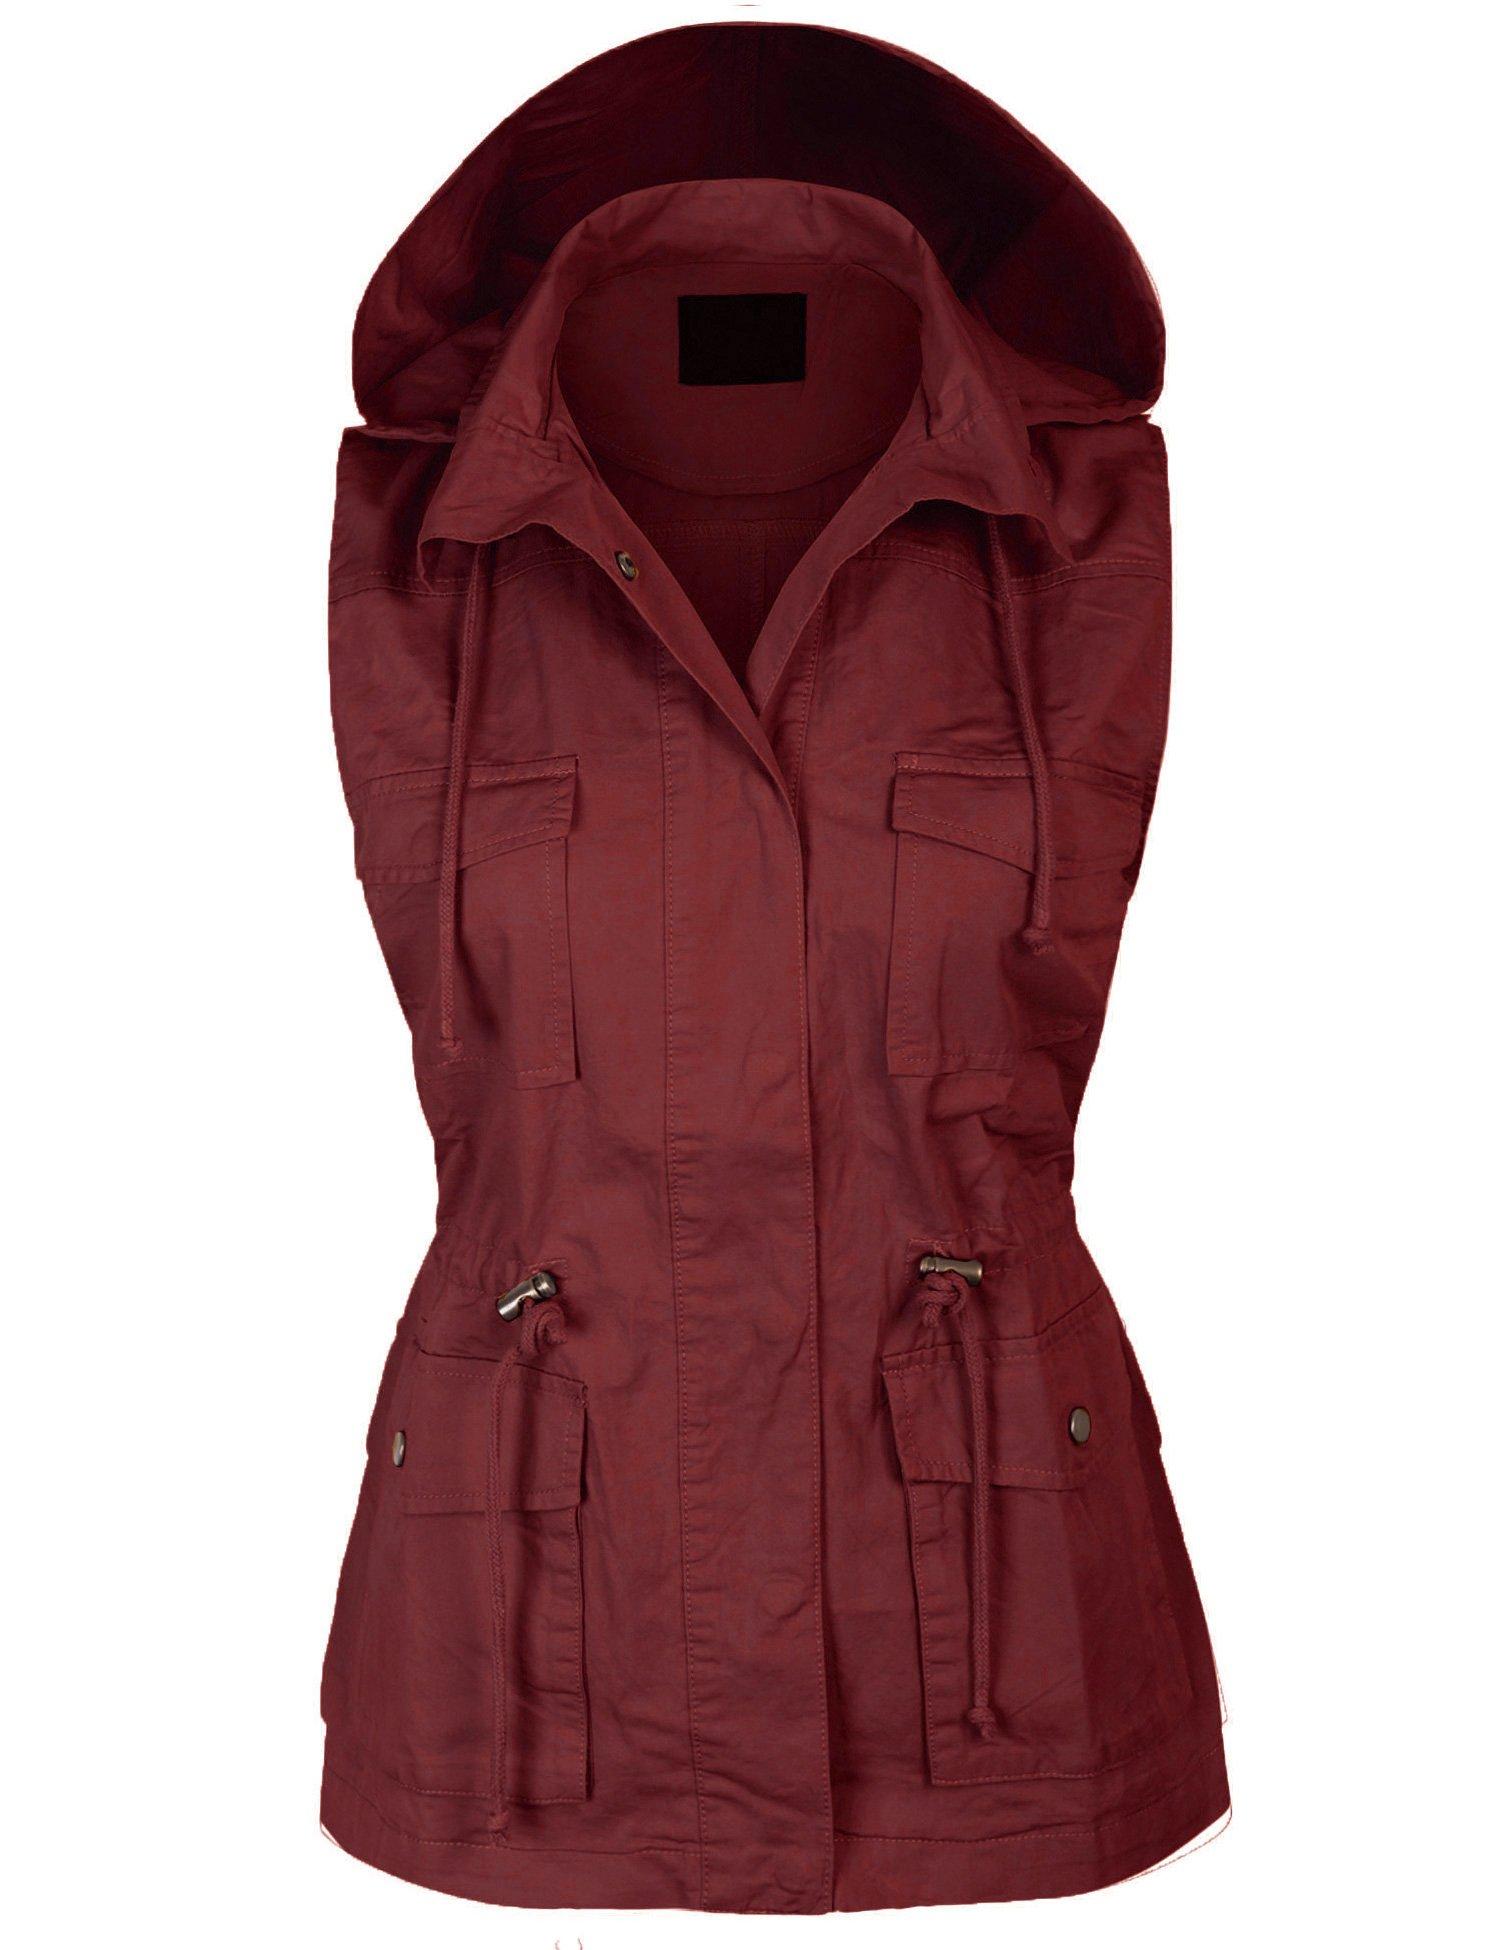 KOGMO Womens Military Anorak Safari Utility Vest with Hood-3X-WINE by KOGMO (Image #1)